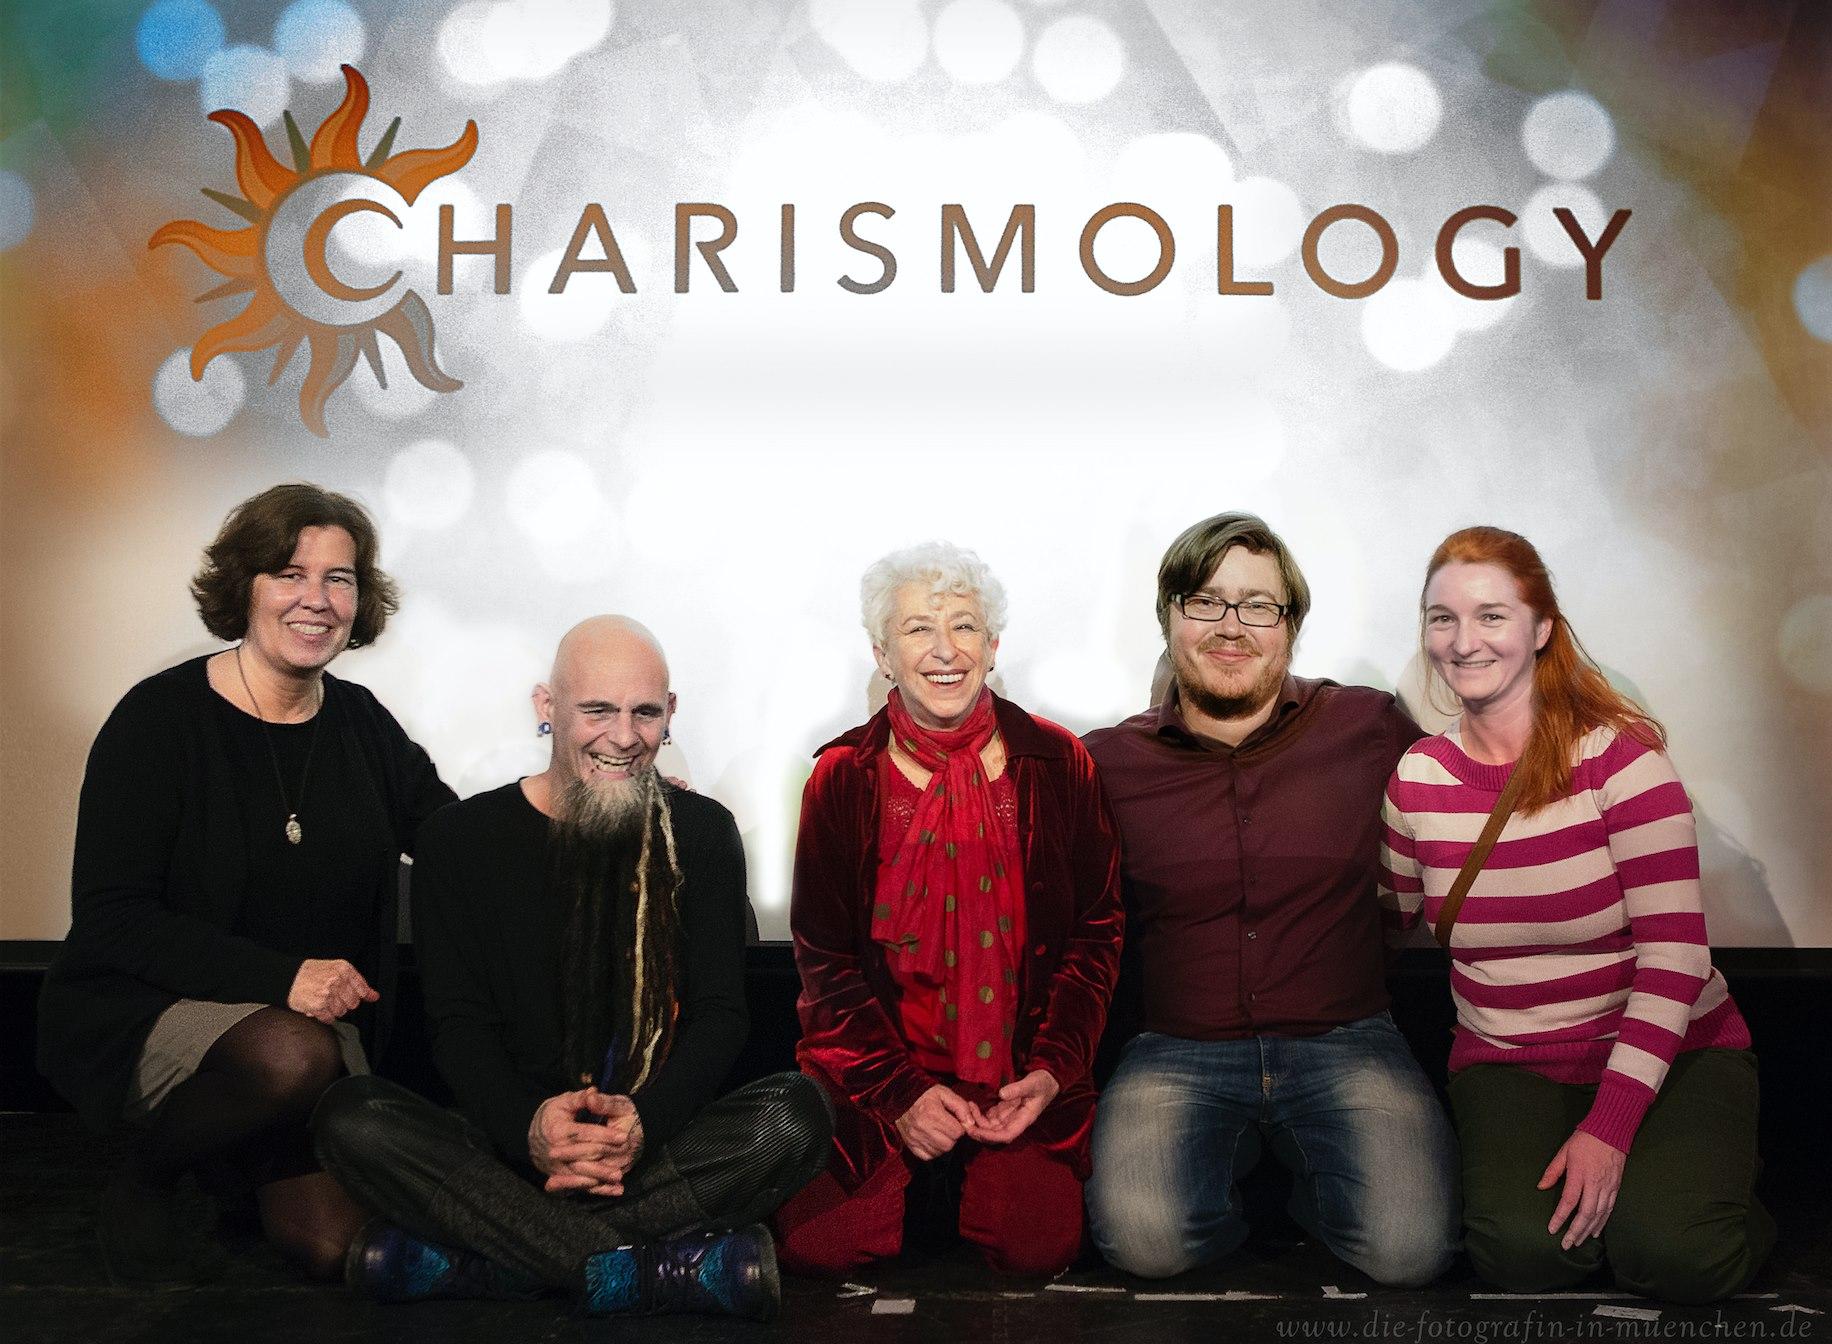 Charismology.com - Power up your charisma